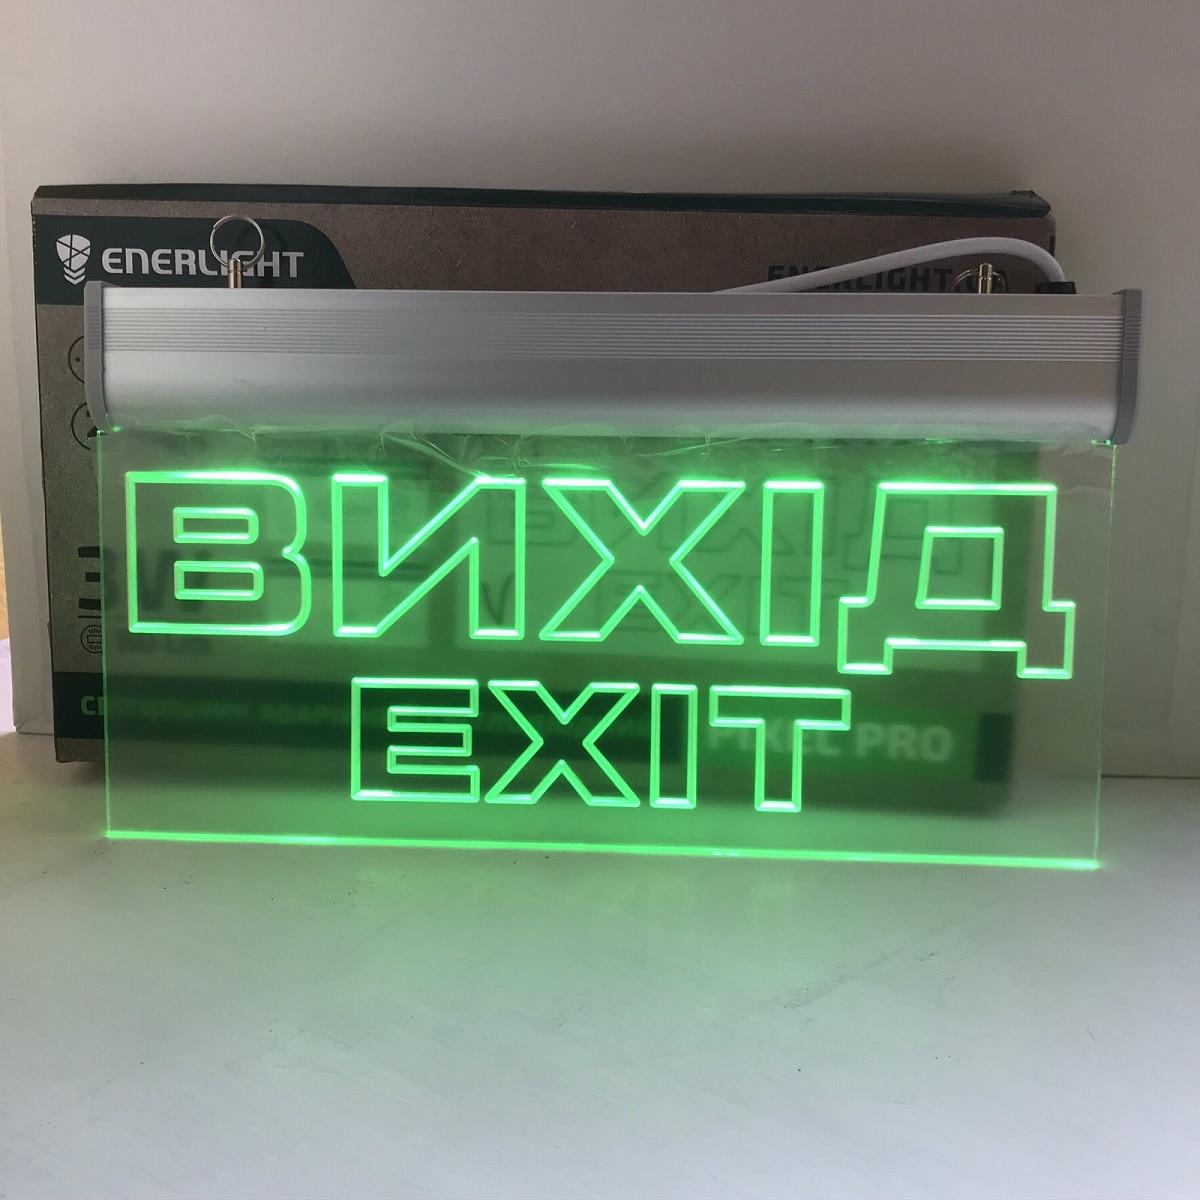 Светодиодное освещение - Аварийный светодиодный светильник ENERLIGHT PIXEL PRO 3ВТ NICD 3H ВИХІД 000002119 - Фото 2